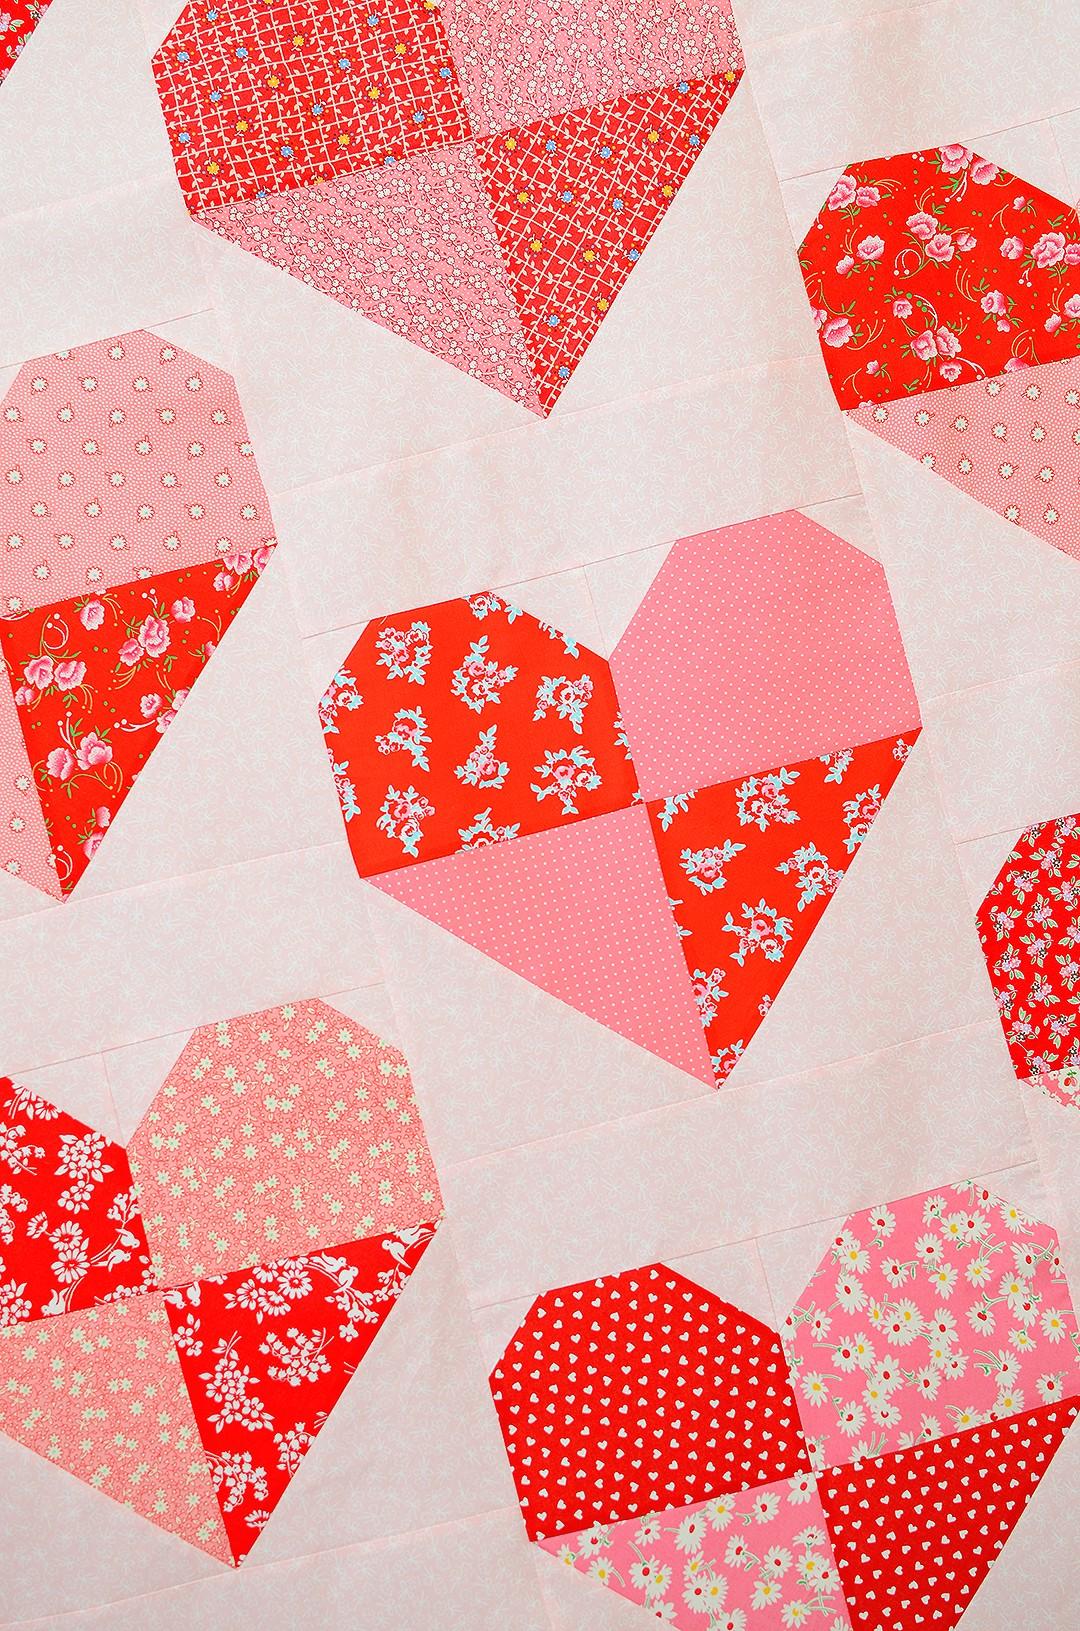 Harlequin Hearts Quilt - Heart Quilt Pattern